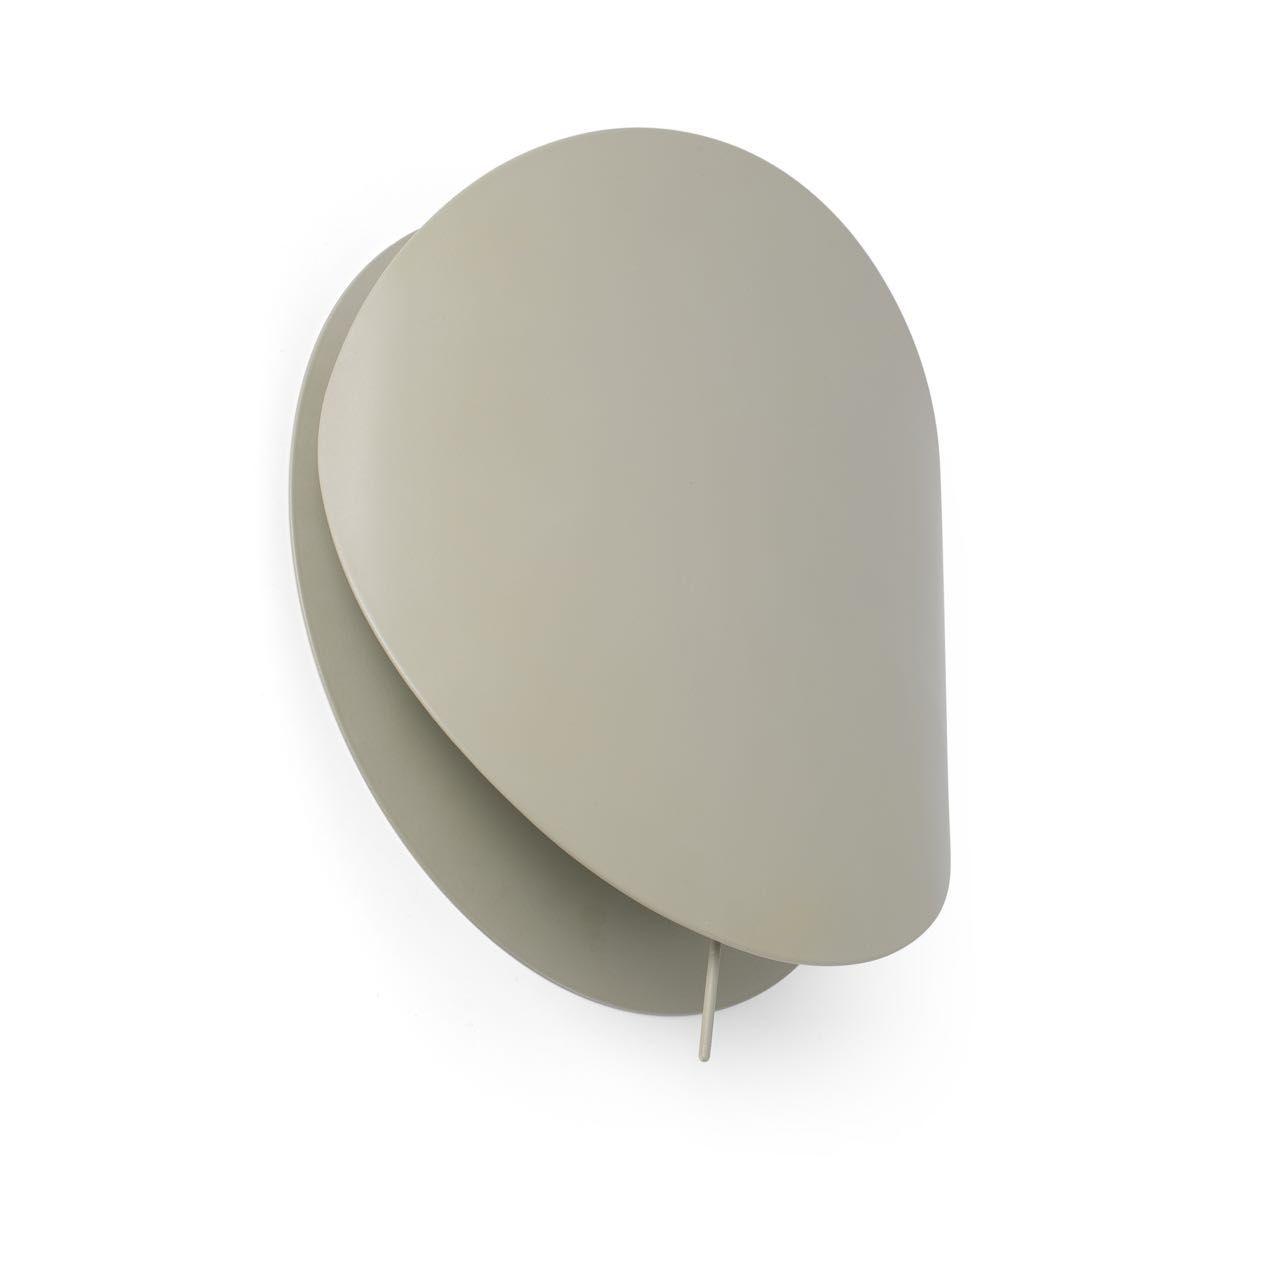 comprar aplique de pared moderno orientable comprar lmparas de pared modernas modernas de diseo